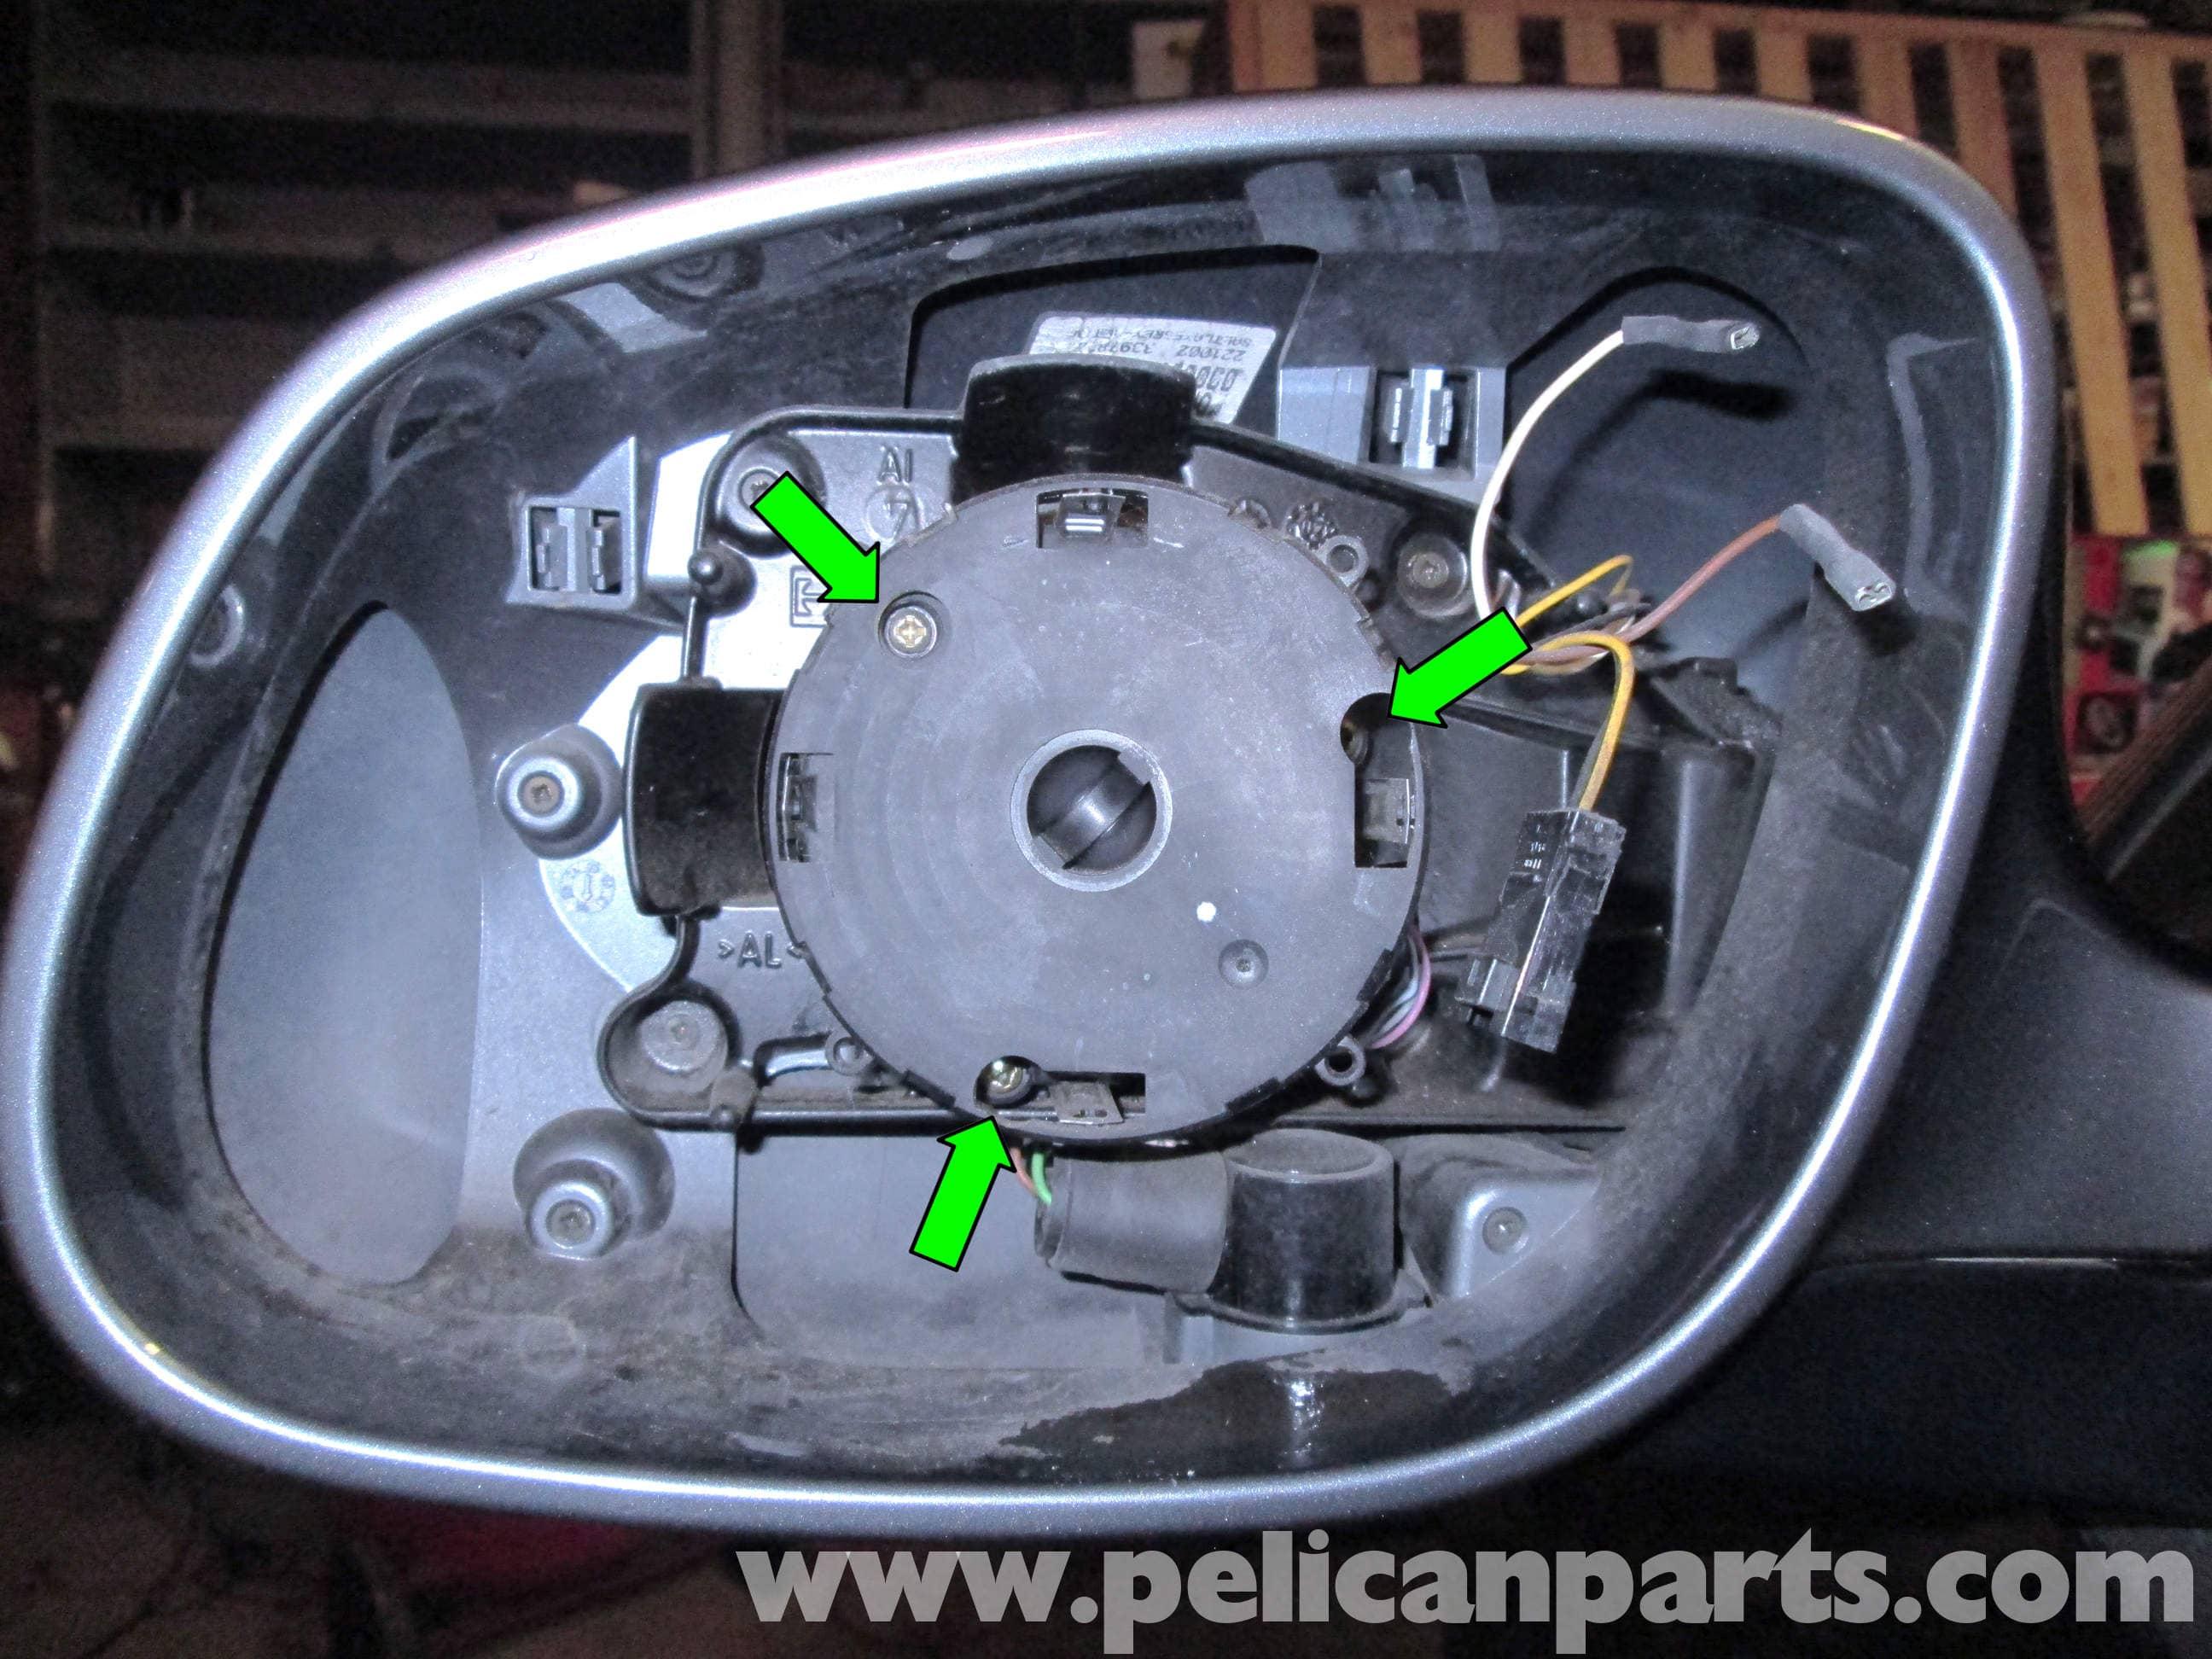 2008 Jeep Commander Fuse Box Diagram Porsche Cayenne Mirror Motor Replacement 2003 2008